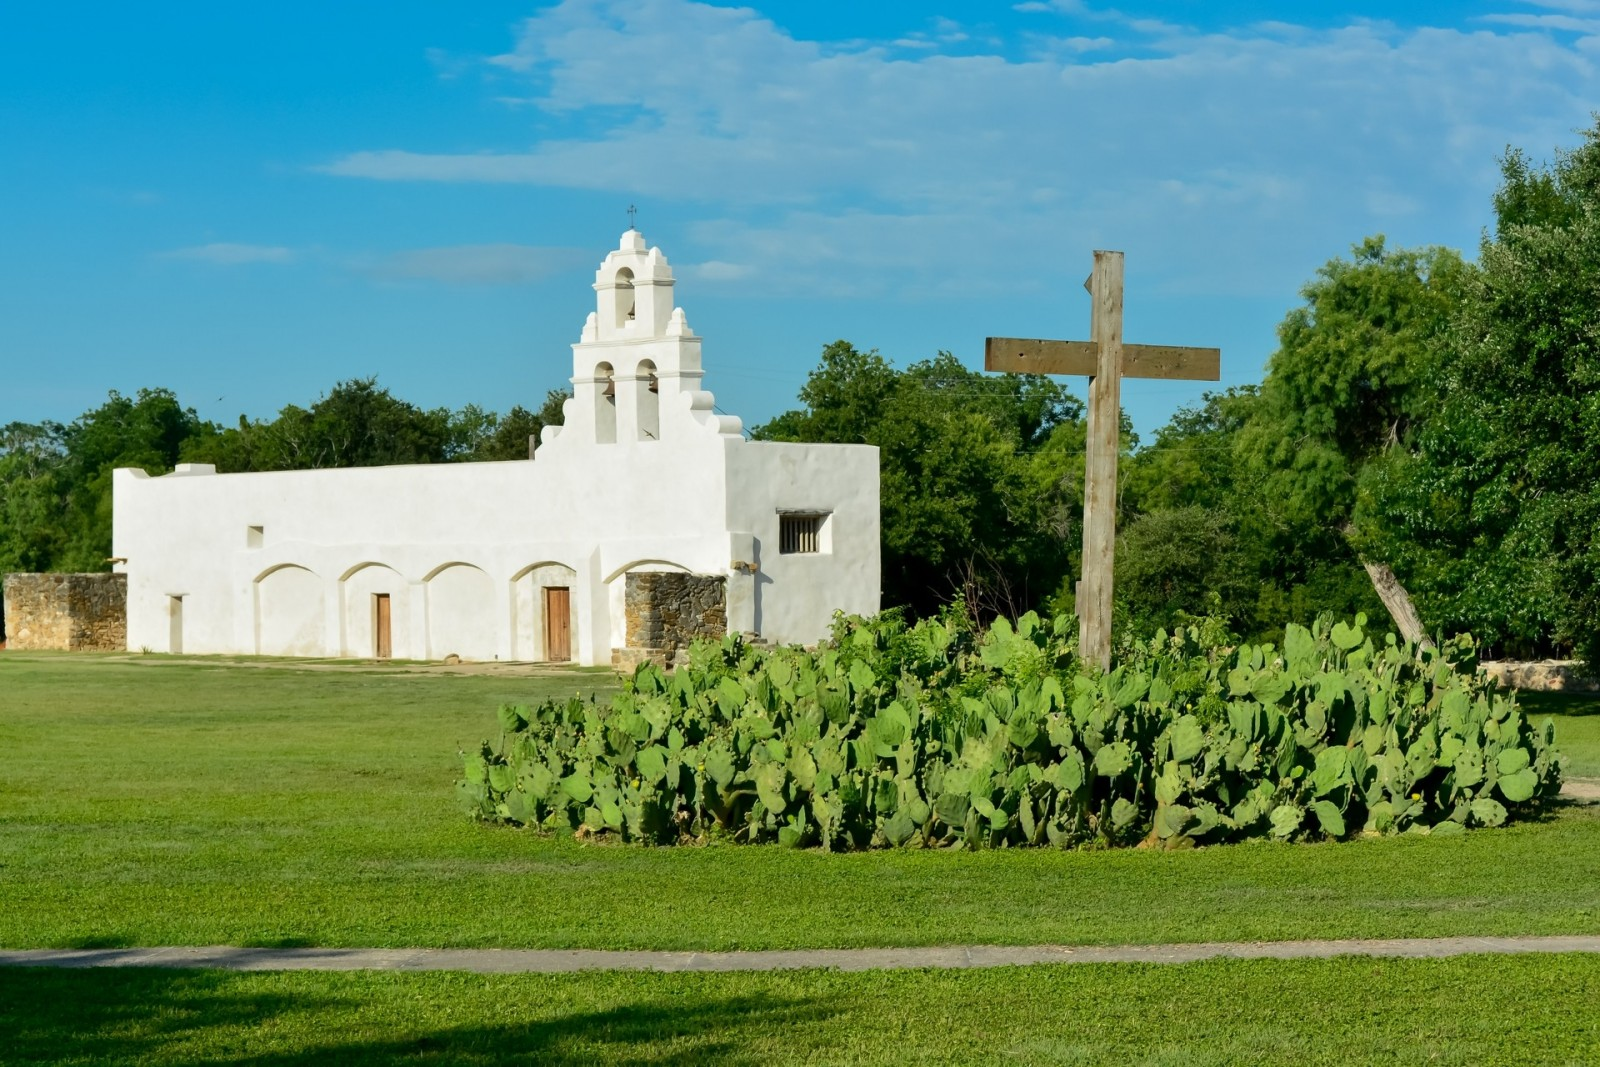 Gallery Whc 2015 San Antonio Missions United States Of